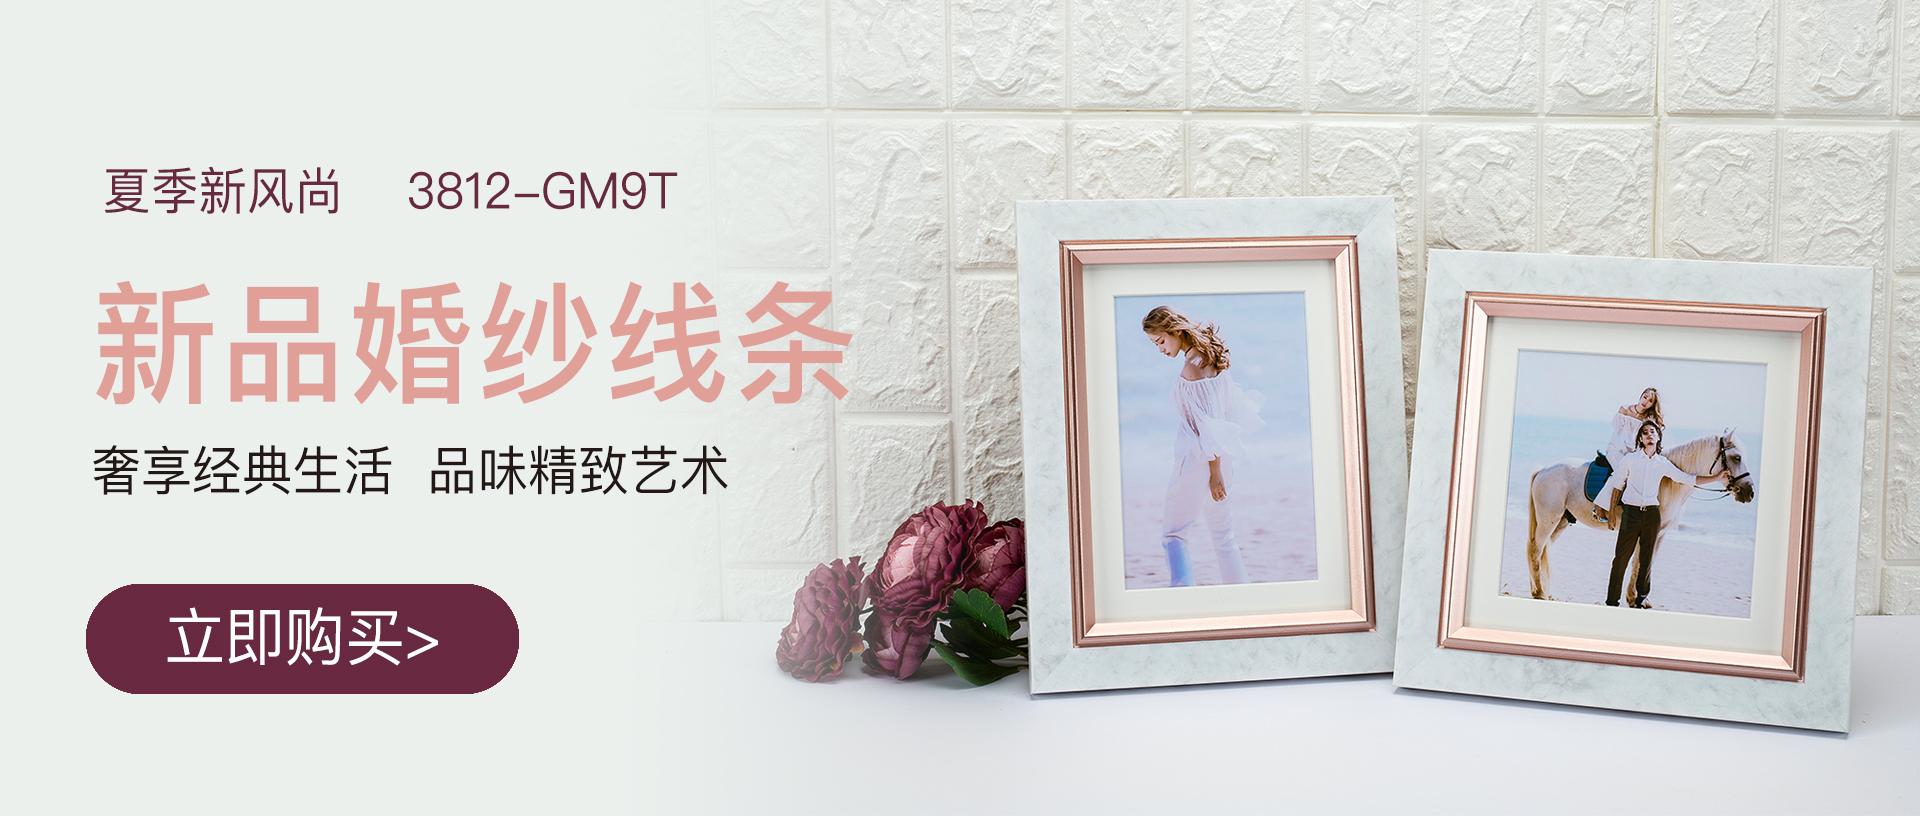 绿林3812-GM9T新品婚纱相框线条banner